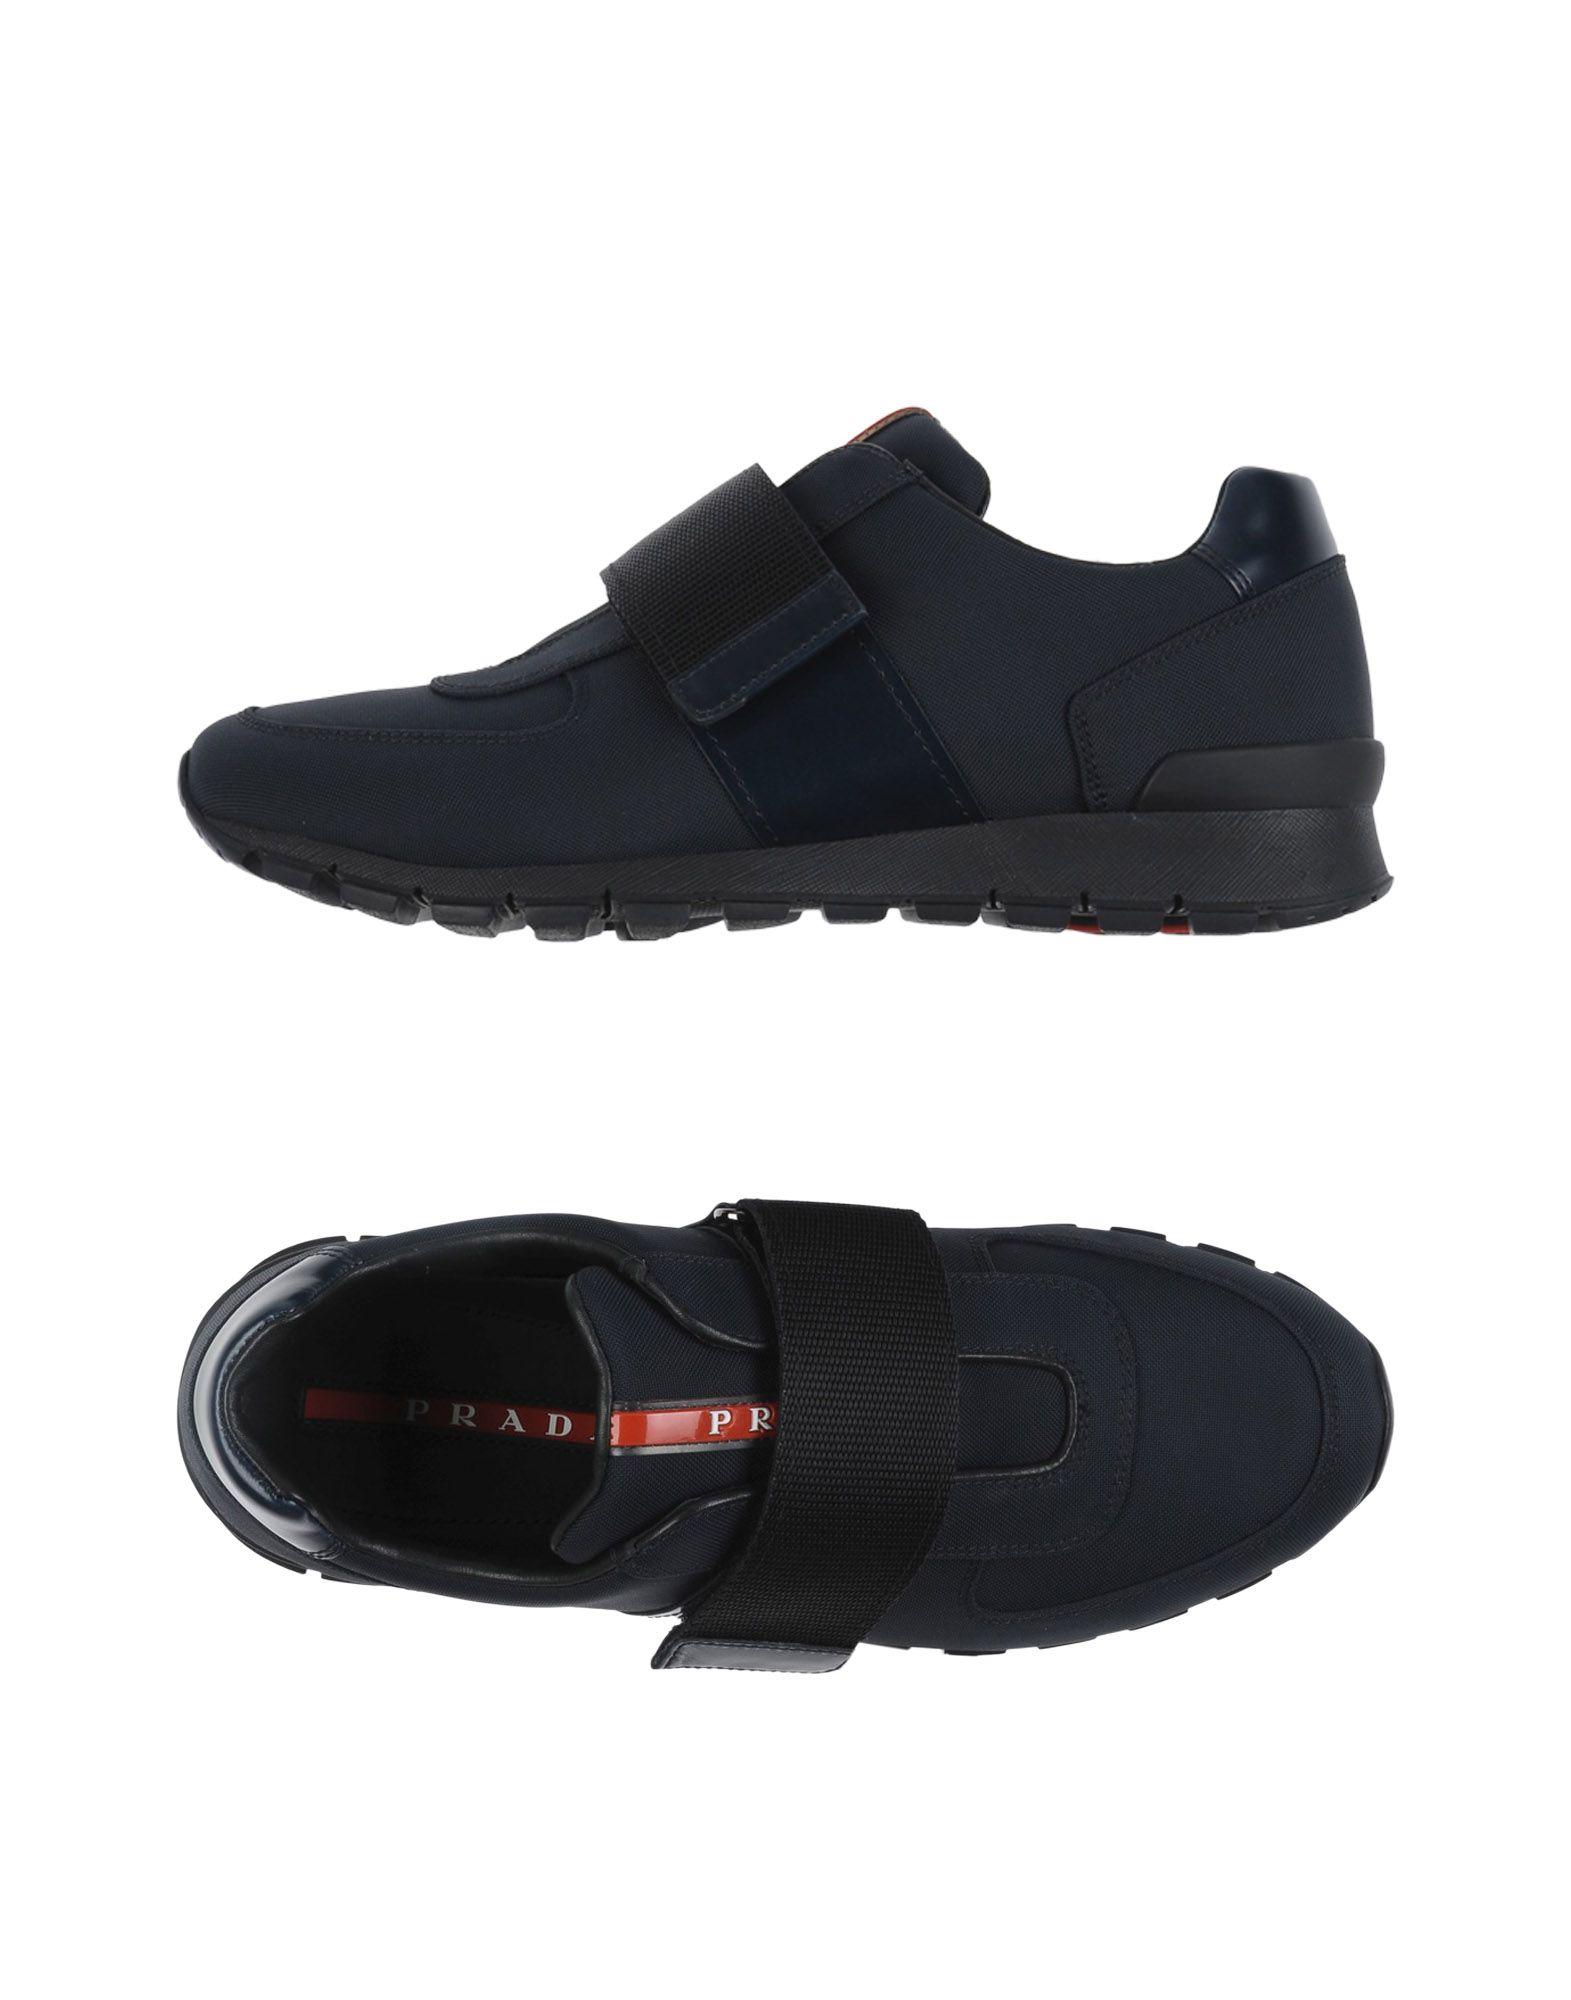 PRADA SPORT Herren Low Sneakers & Tennisschuhe Farbe Dunkelblau Größe 8